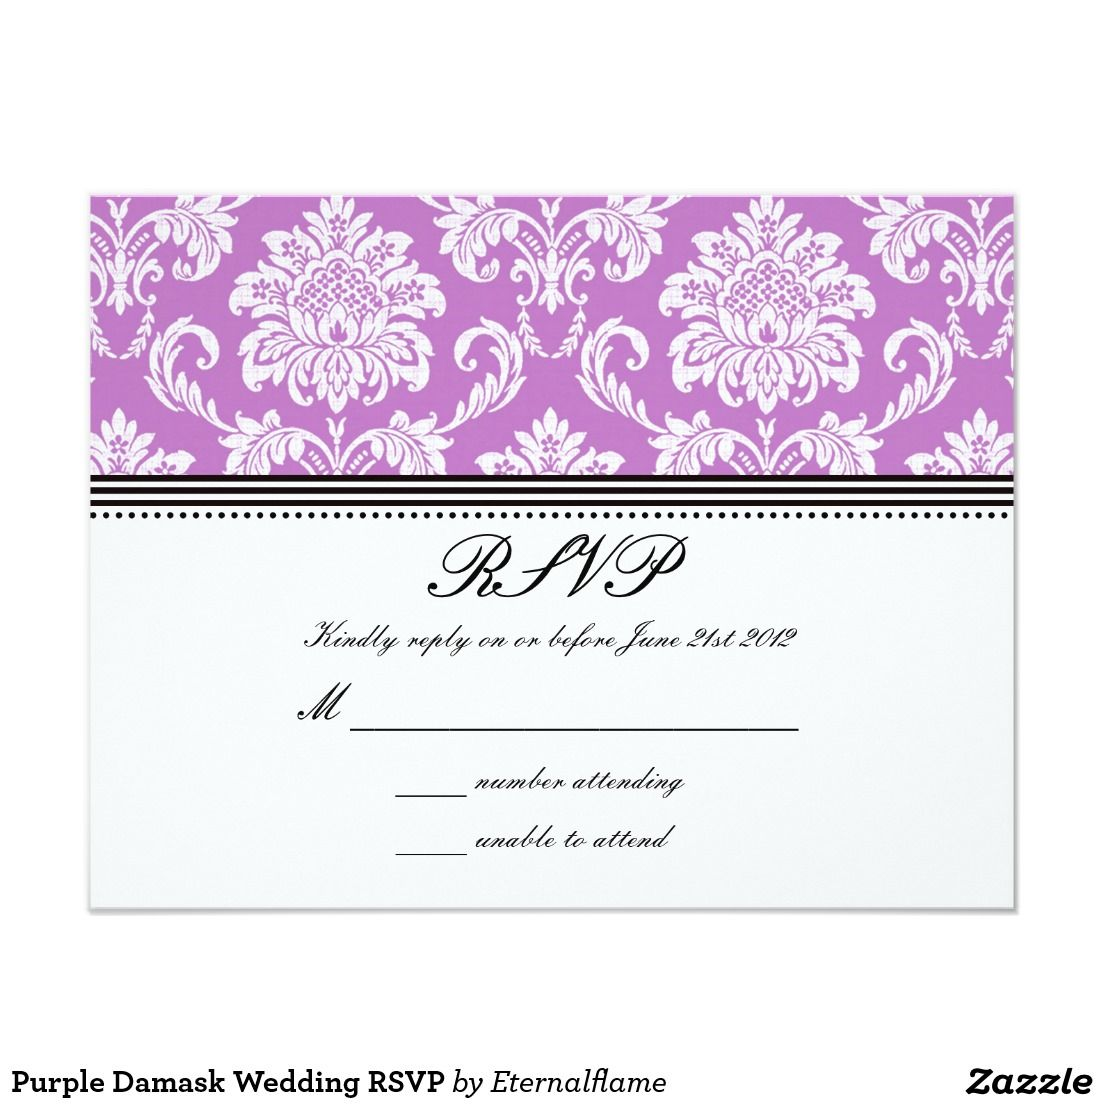 Purple Damask Wedding RSVP | Rsvp, Damask wedding and Wedding rsvp